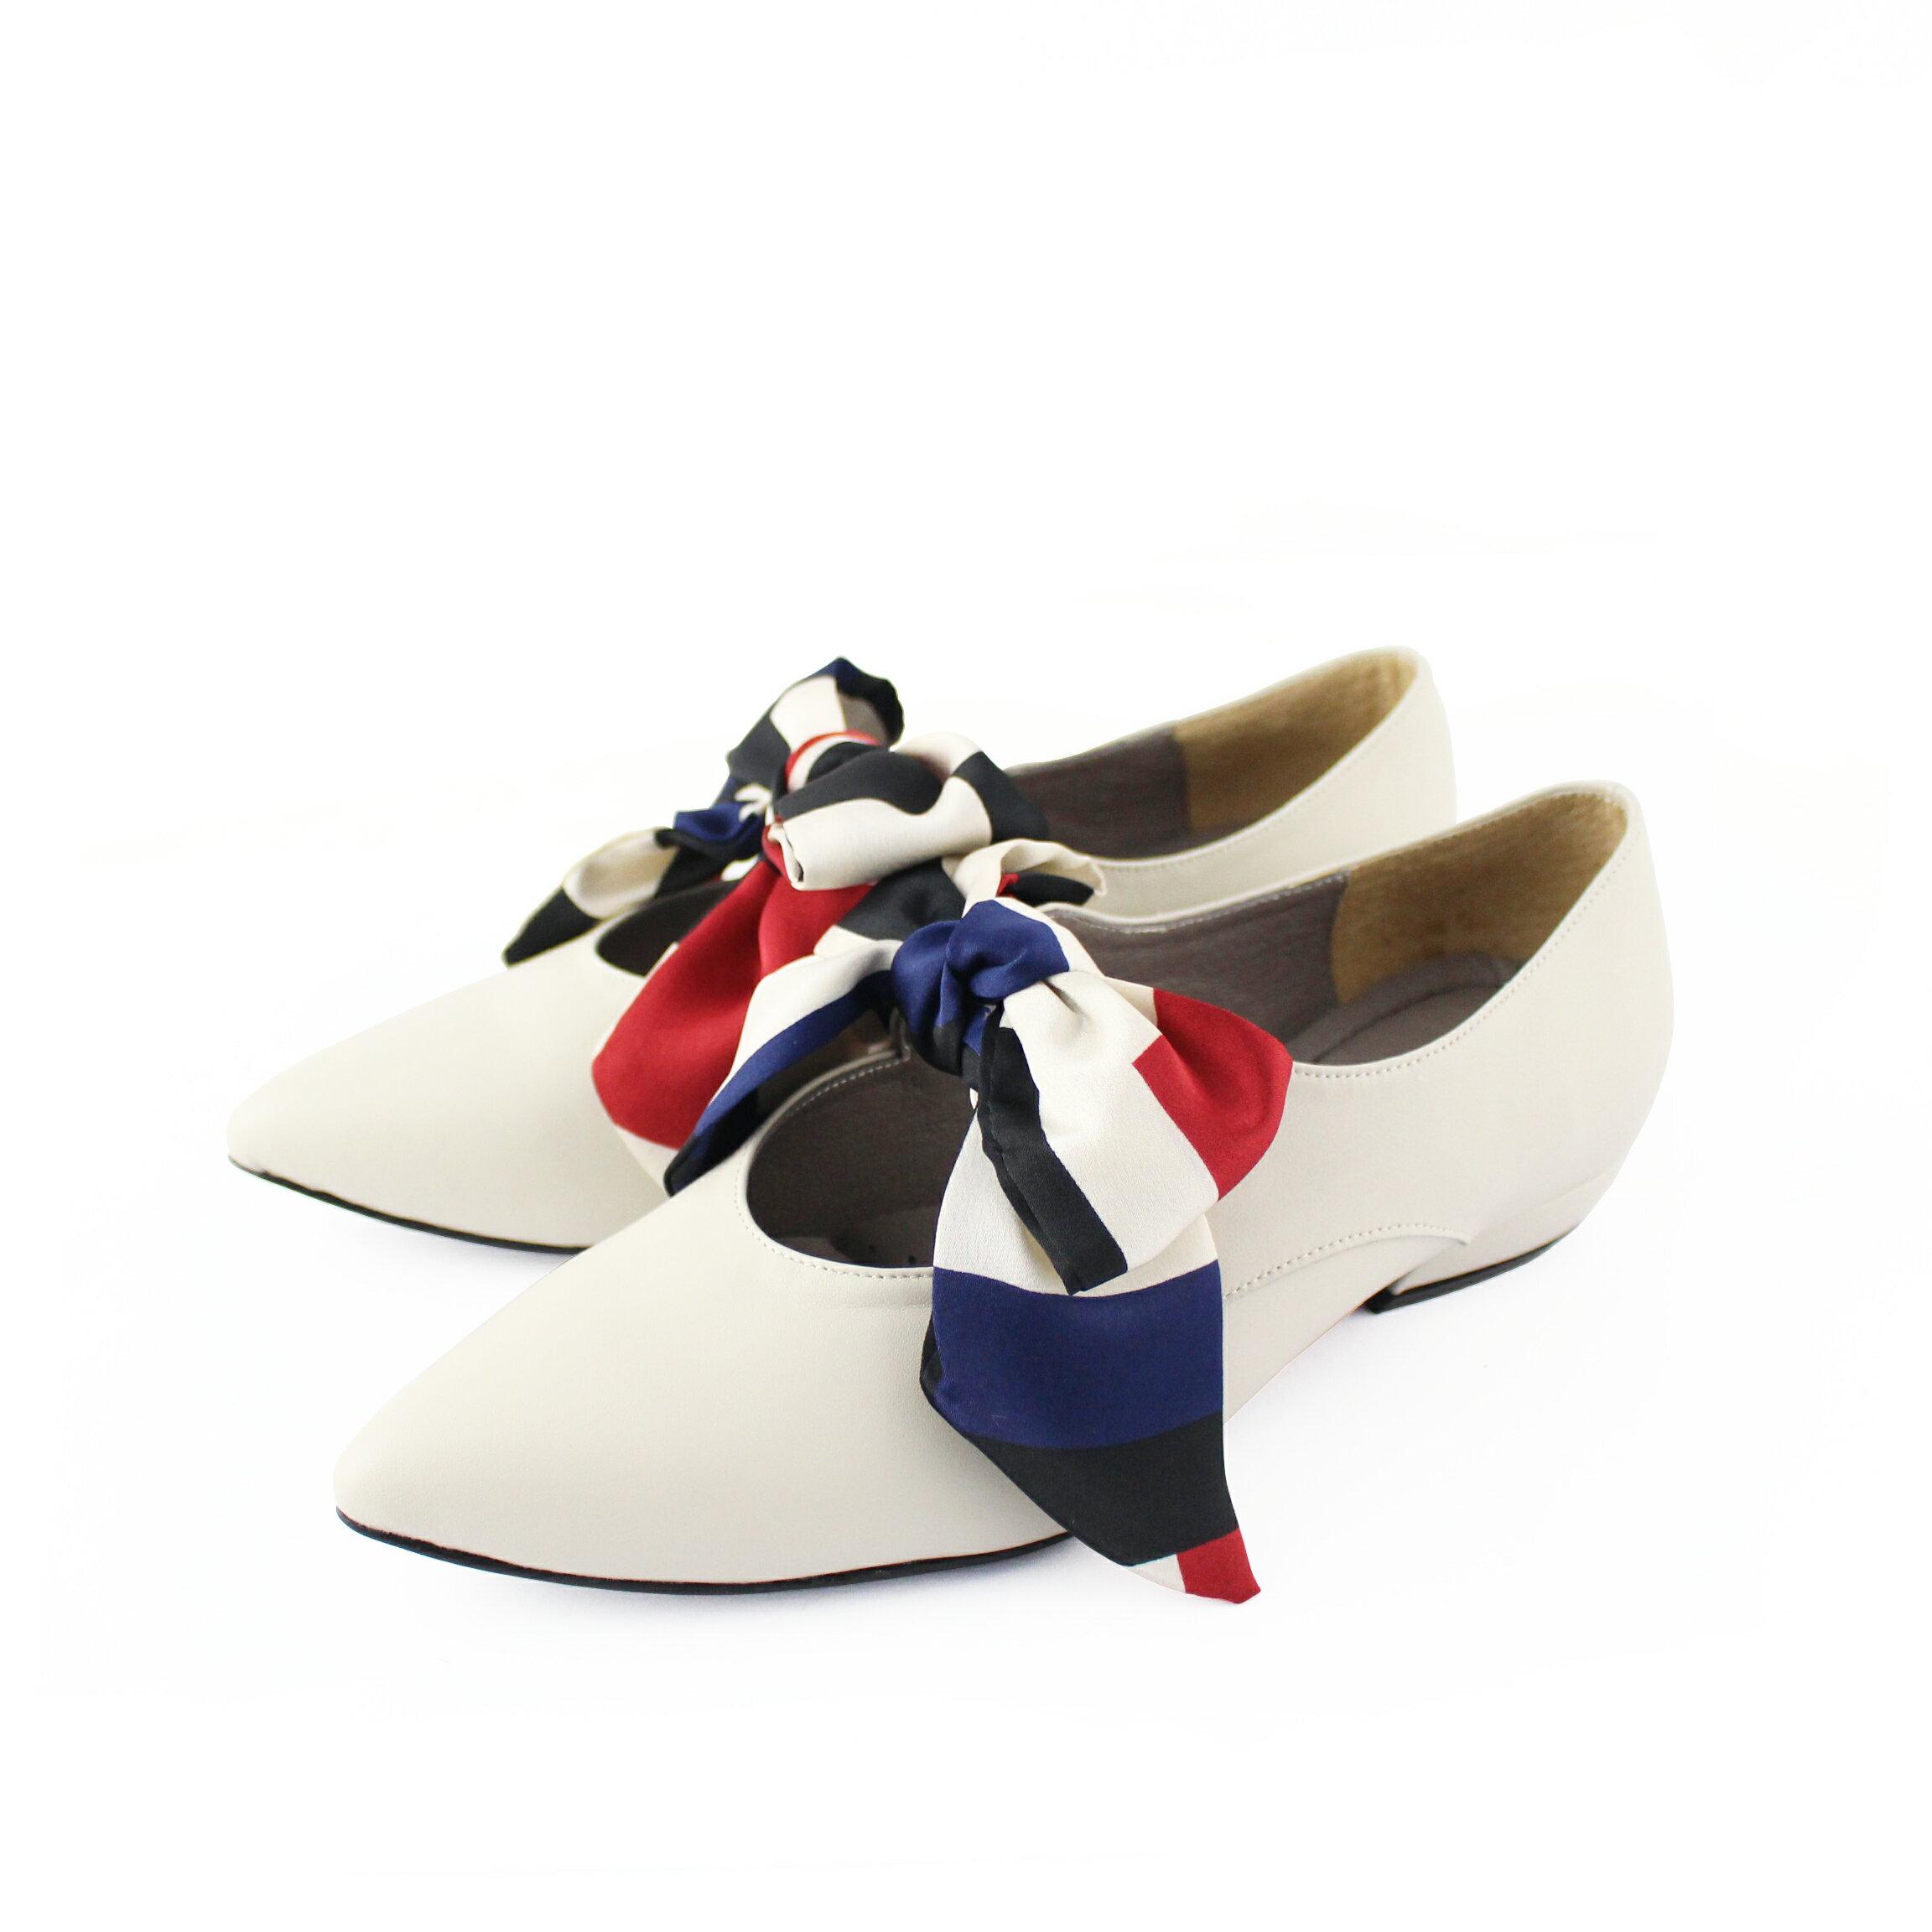 【F2-19104L】優雅緞布蝴蝶結低跟鞋_Shoes Party 6